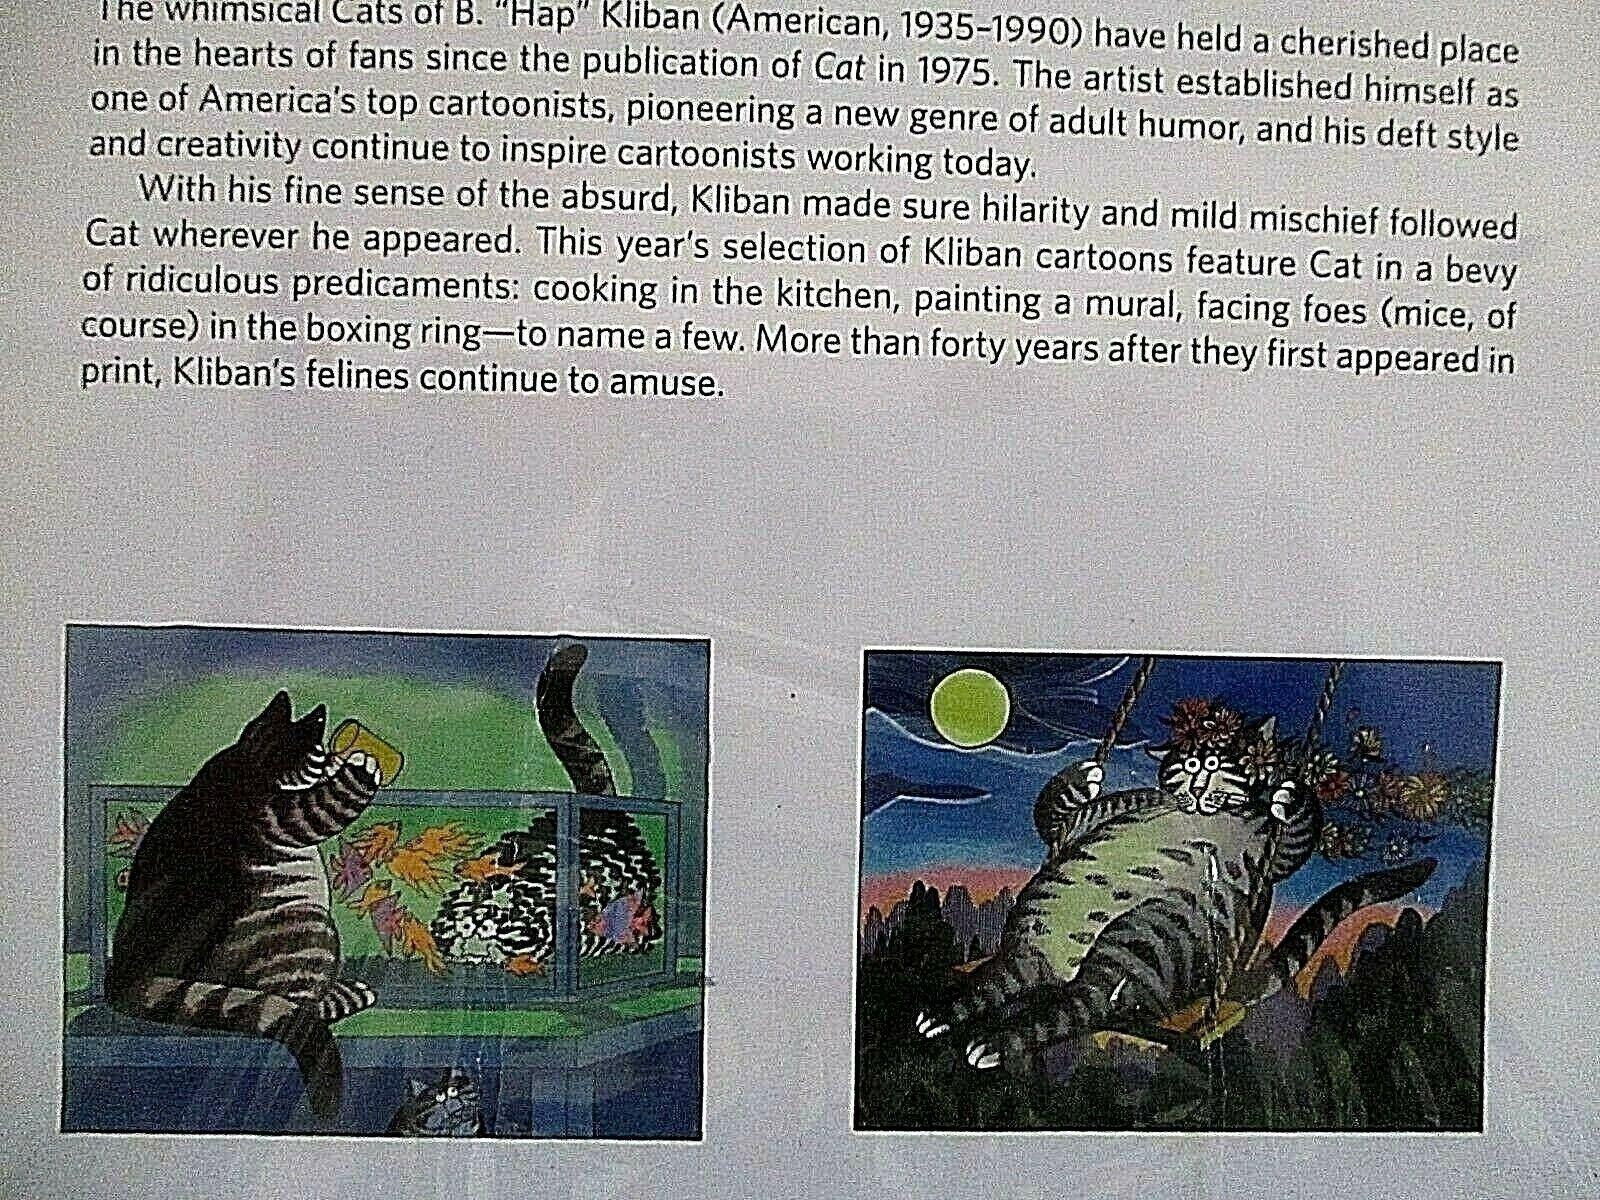 B. Kliban - Catcalendar 2019 Cat Calendar | Ebay B Kliban Cat Calendar 2019